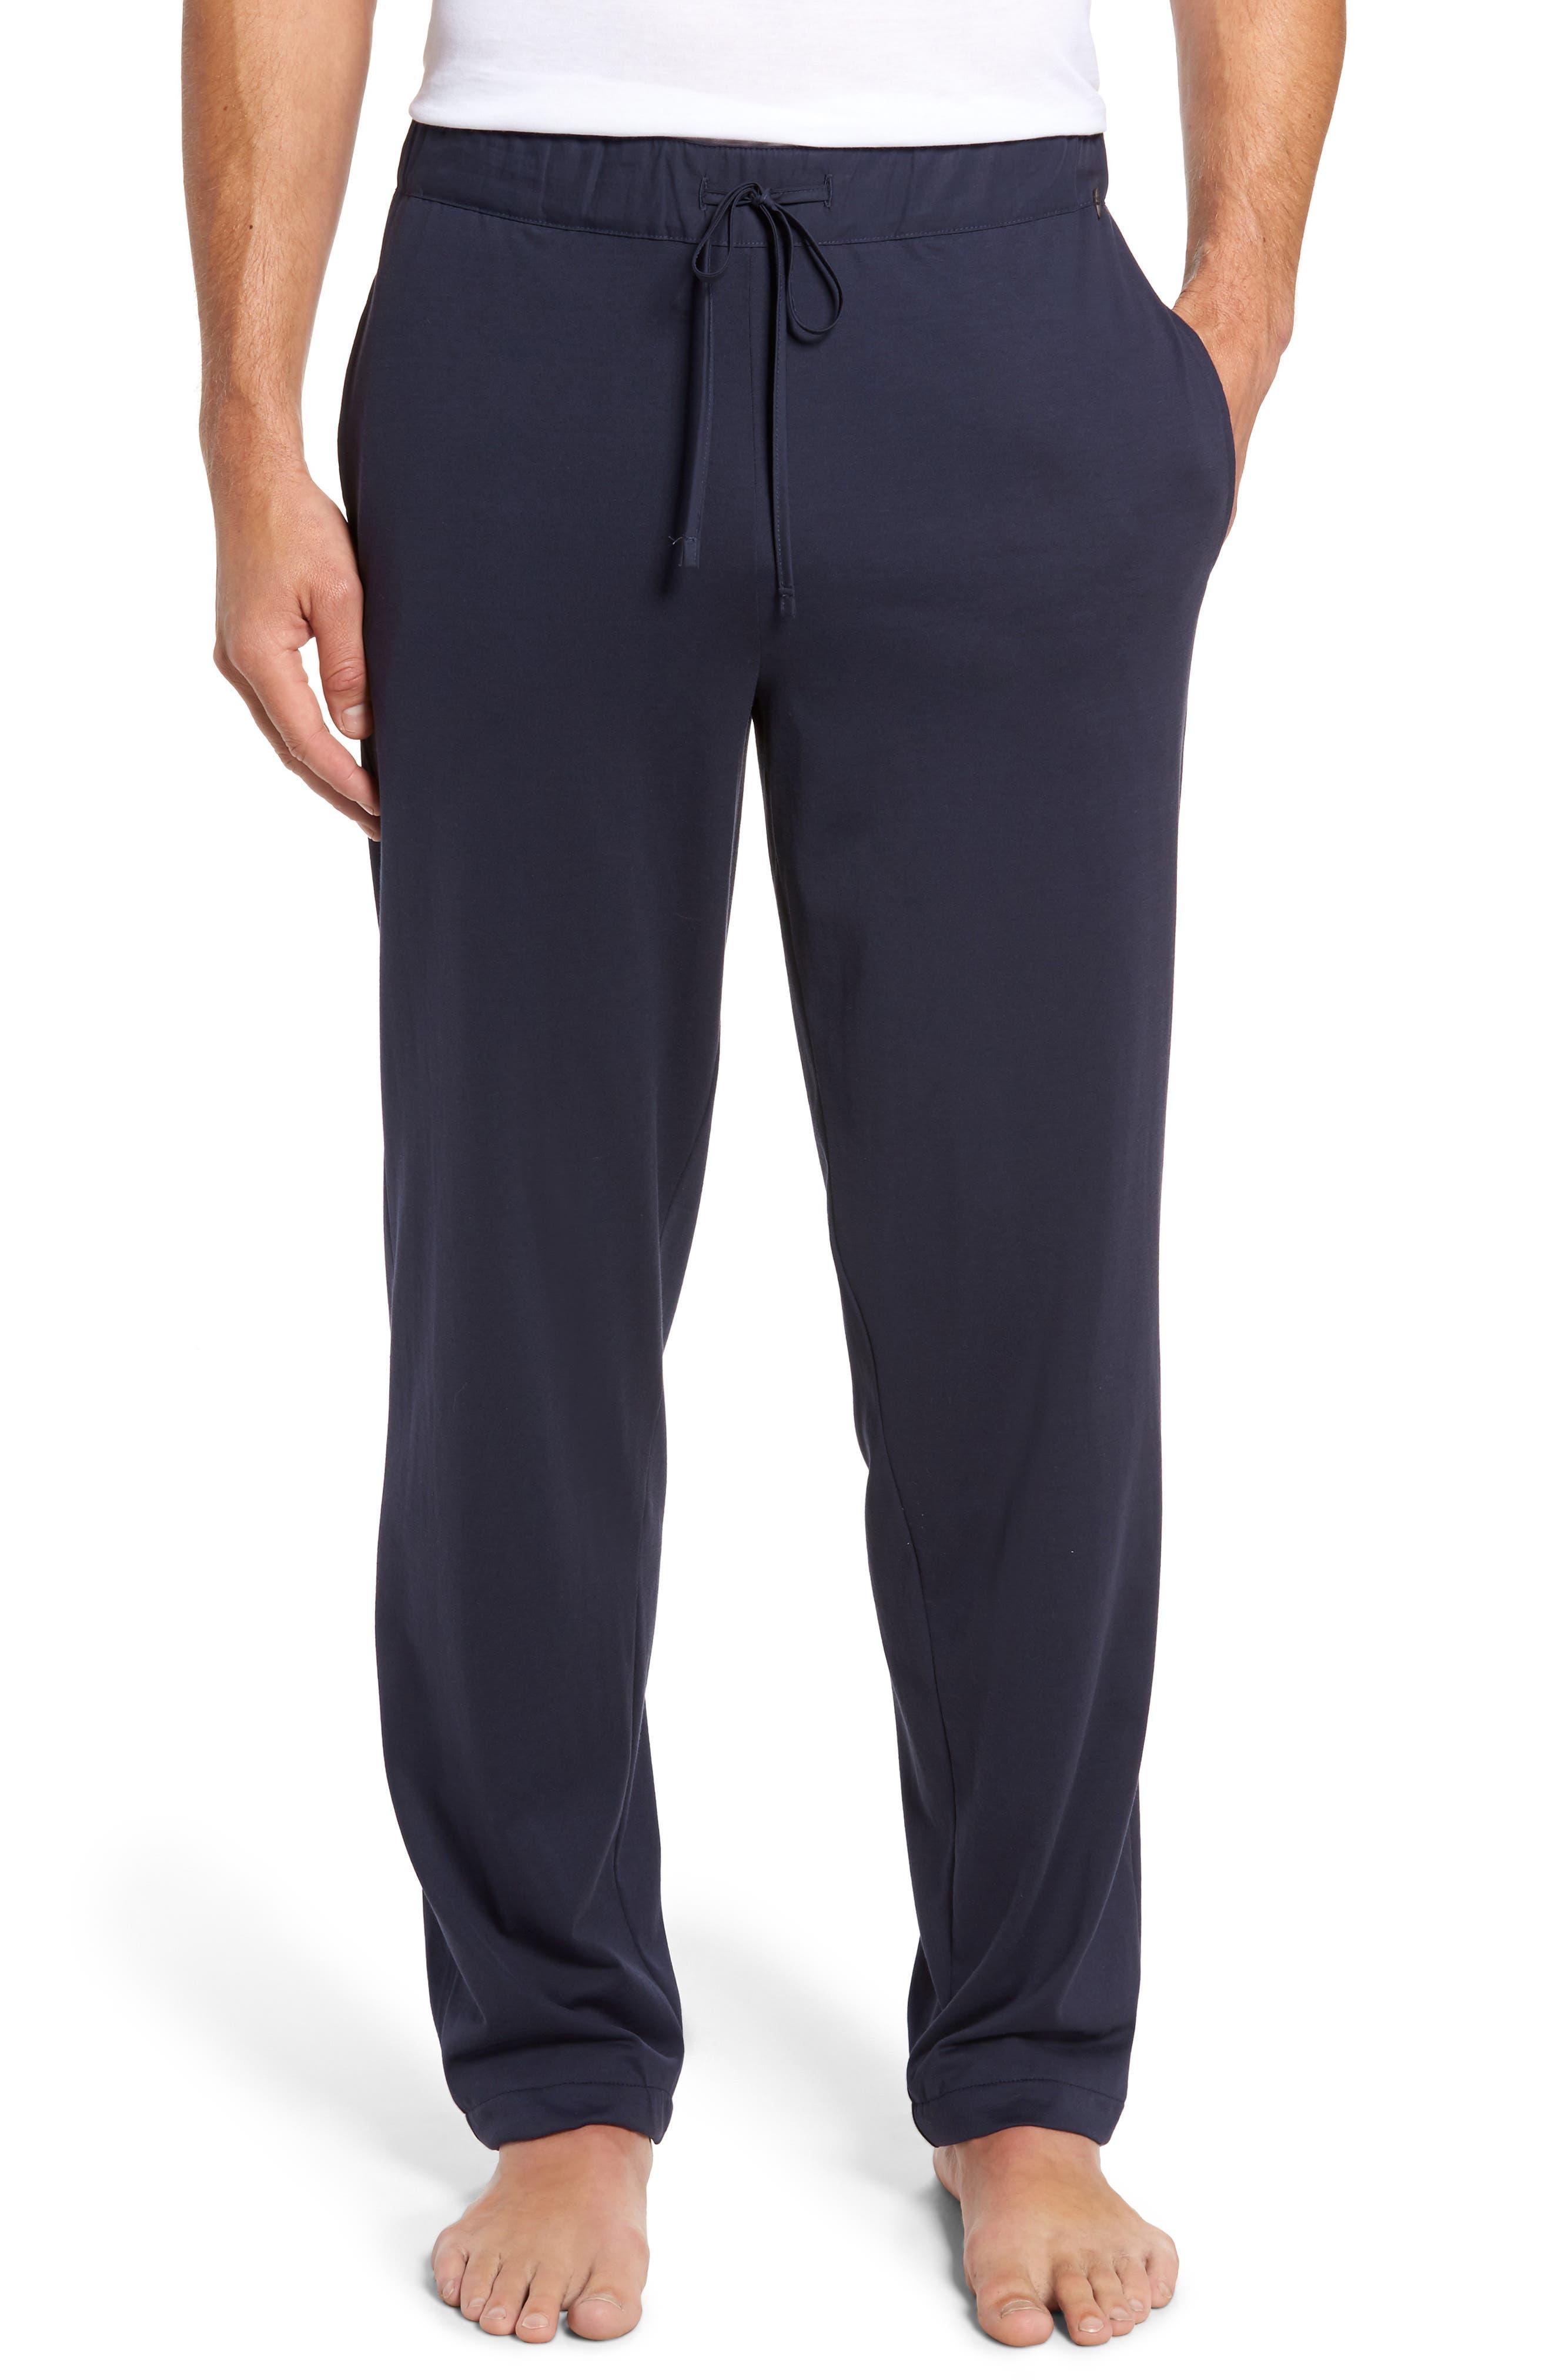 HANRO Night & Day Knit Lounge Pants, Main, color, BLACK IRIS